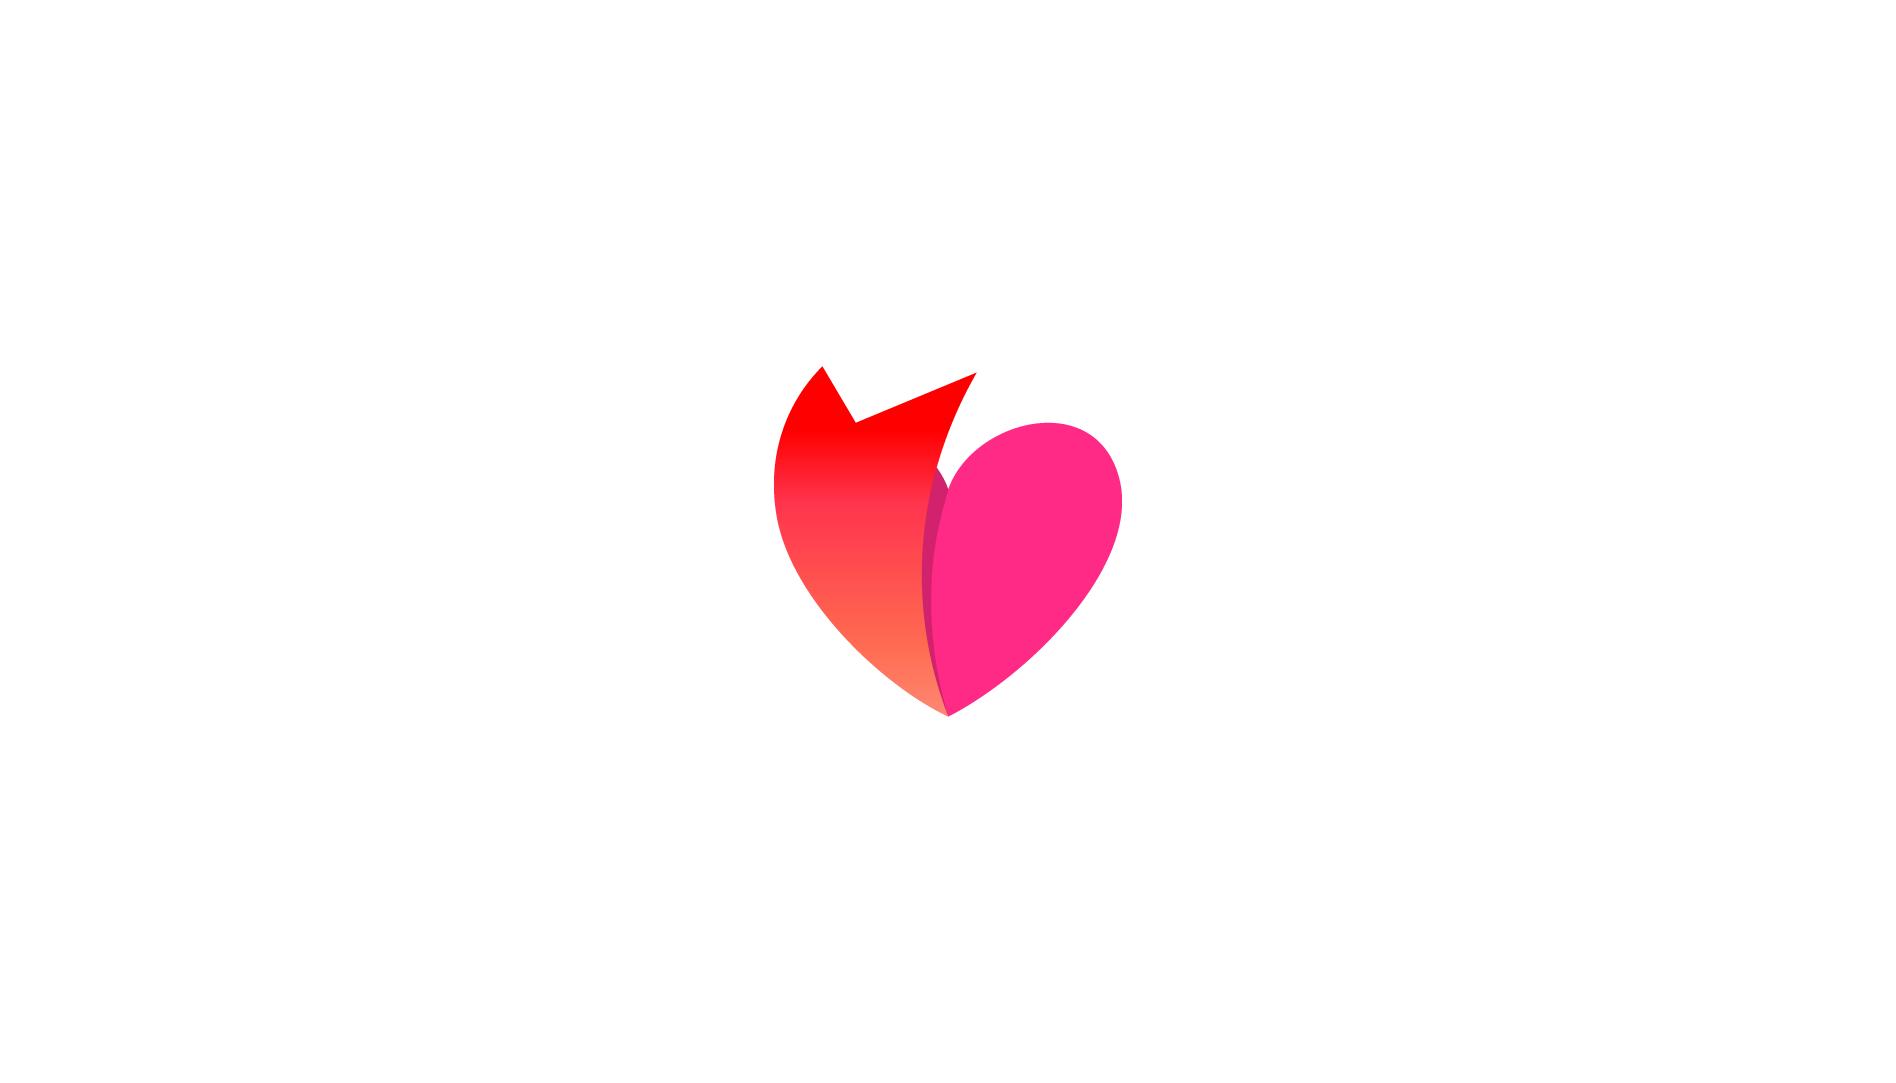 mc_01